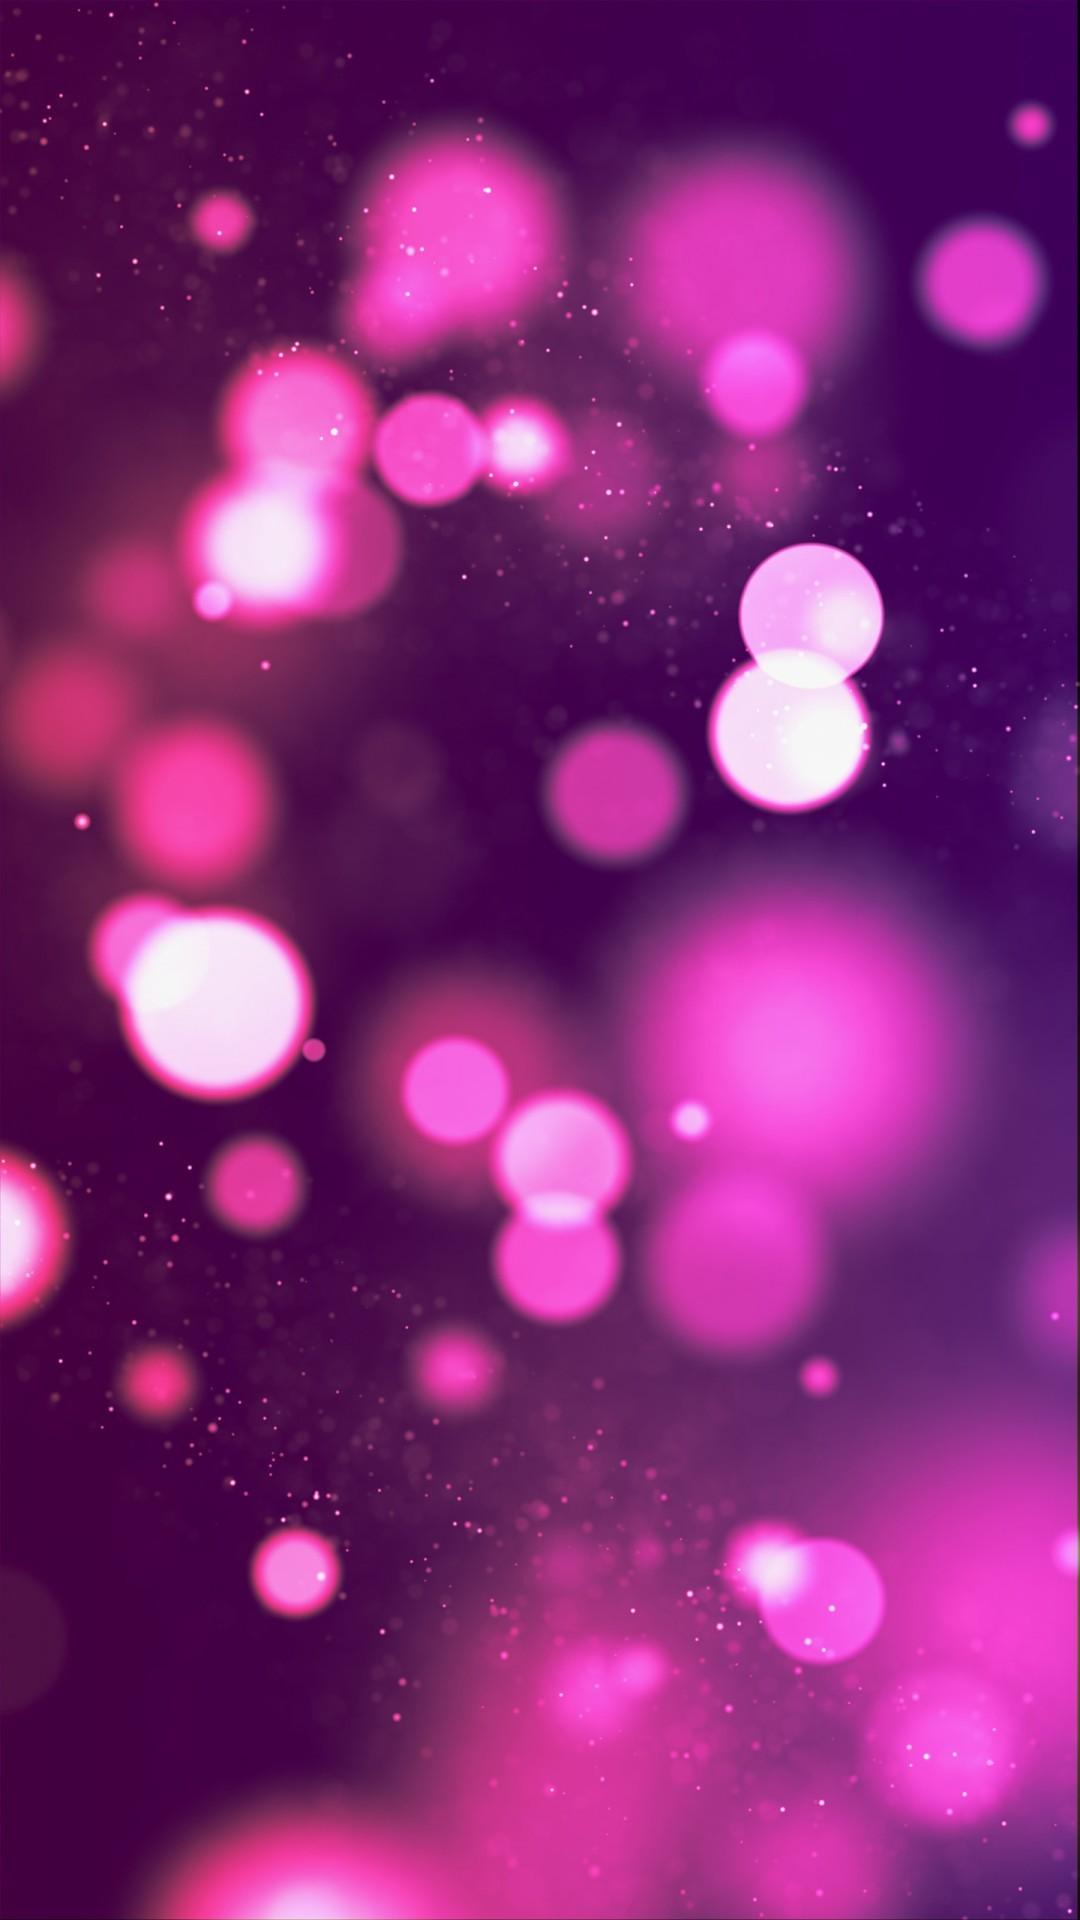 Free Pink Lights Bokeh phone wallpaper by rent23